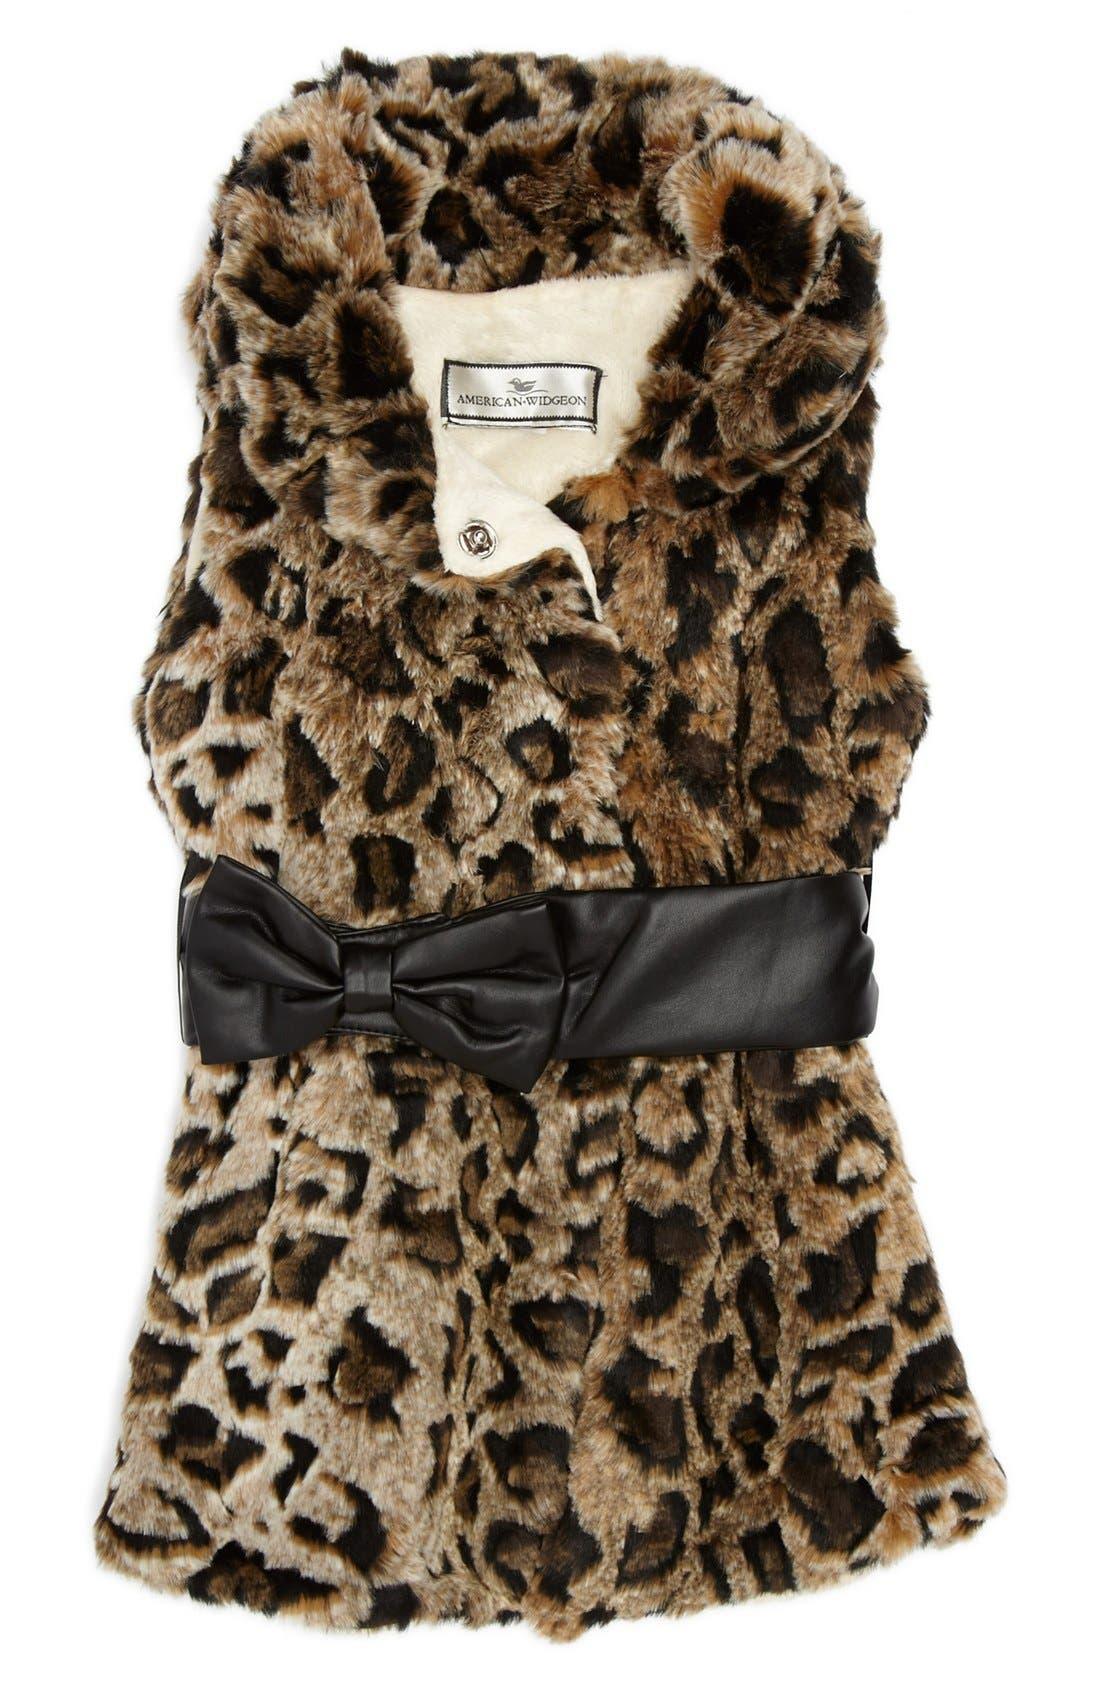 Alternate Image 1 Selected - Widgeon 'Bow' Faux Fur Vest (Little Girls)